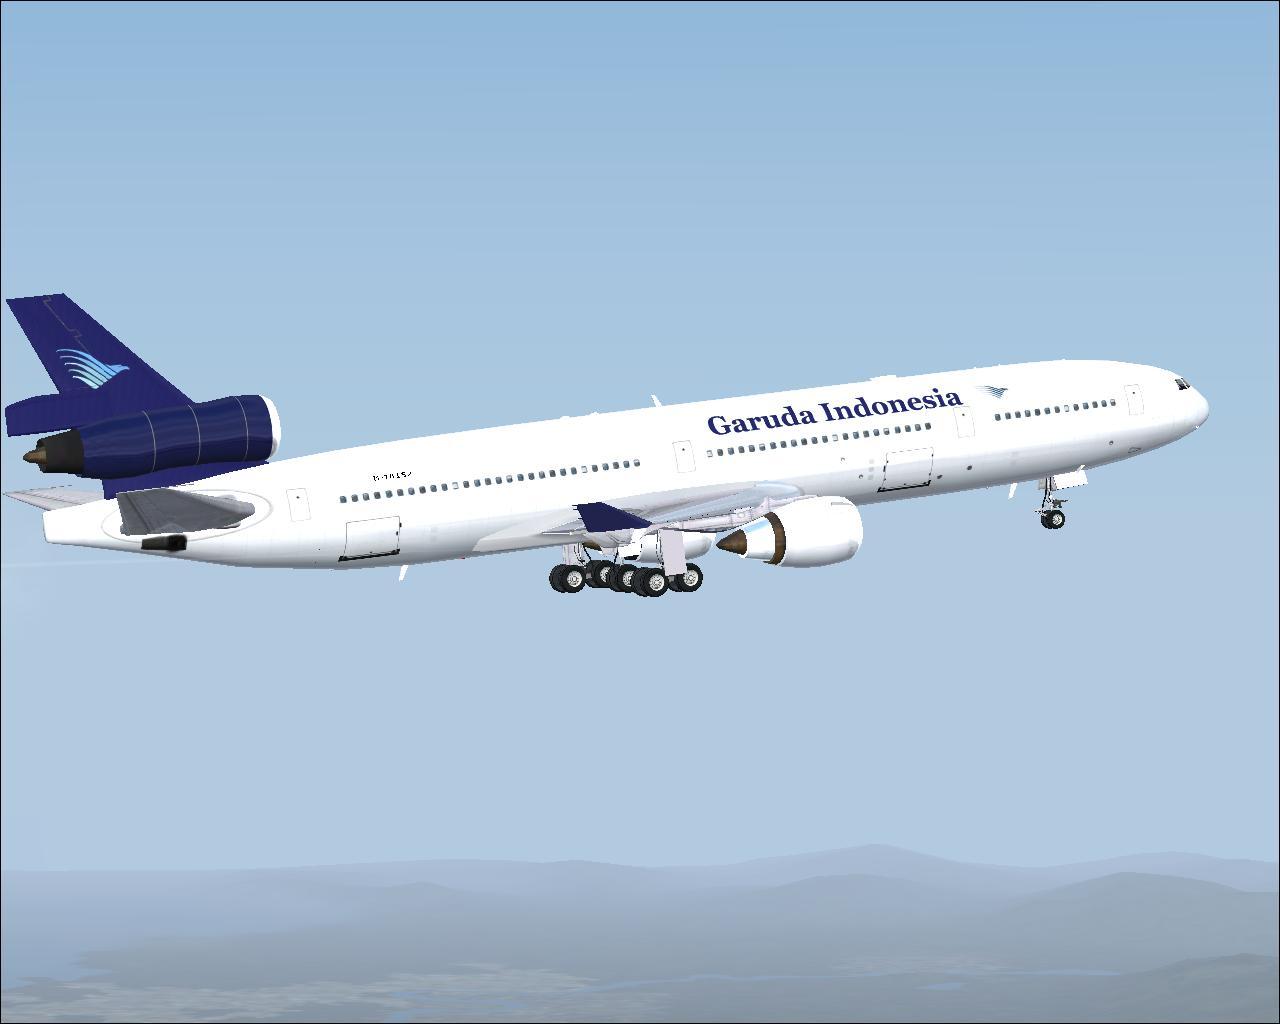 http://1.bp.blogspot.com/_cgCT3NaBXTU/TDdCdhTtYrI/AAAAAAAAAwM/VwMXtrhTMJM/s1600/airline+garudaIndonesiaDC10a.jpg